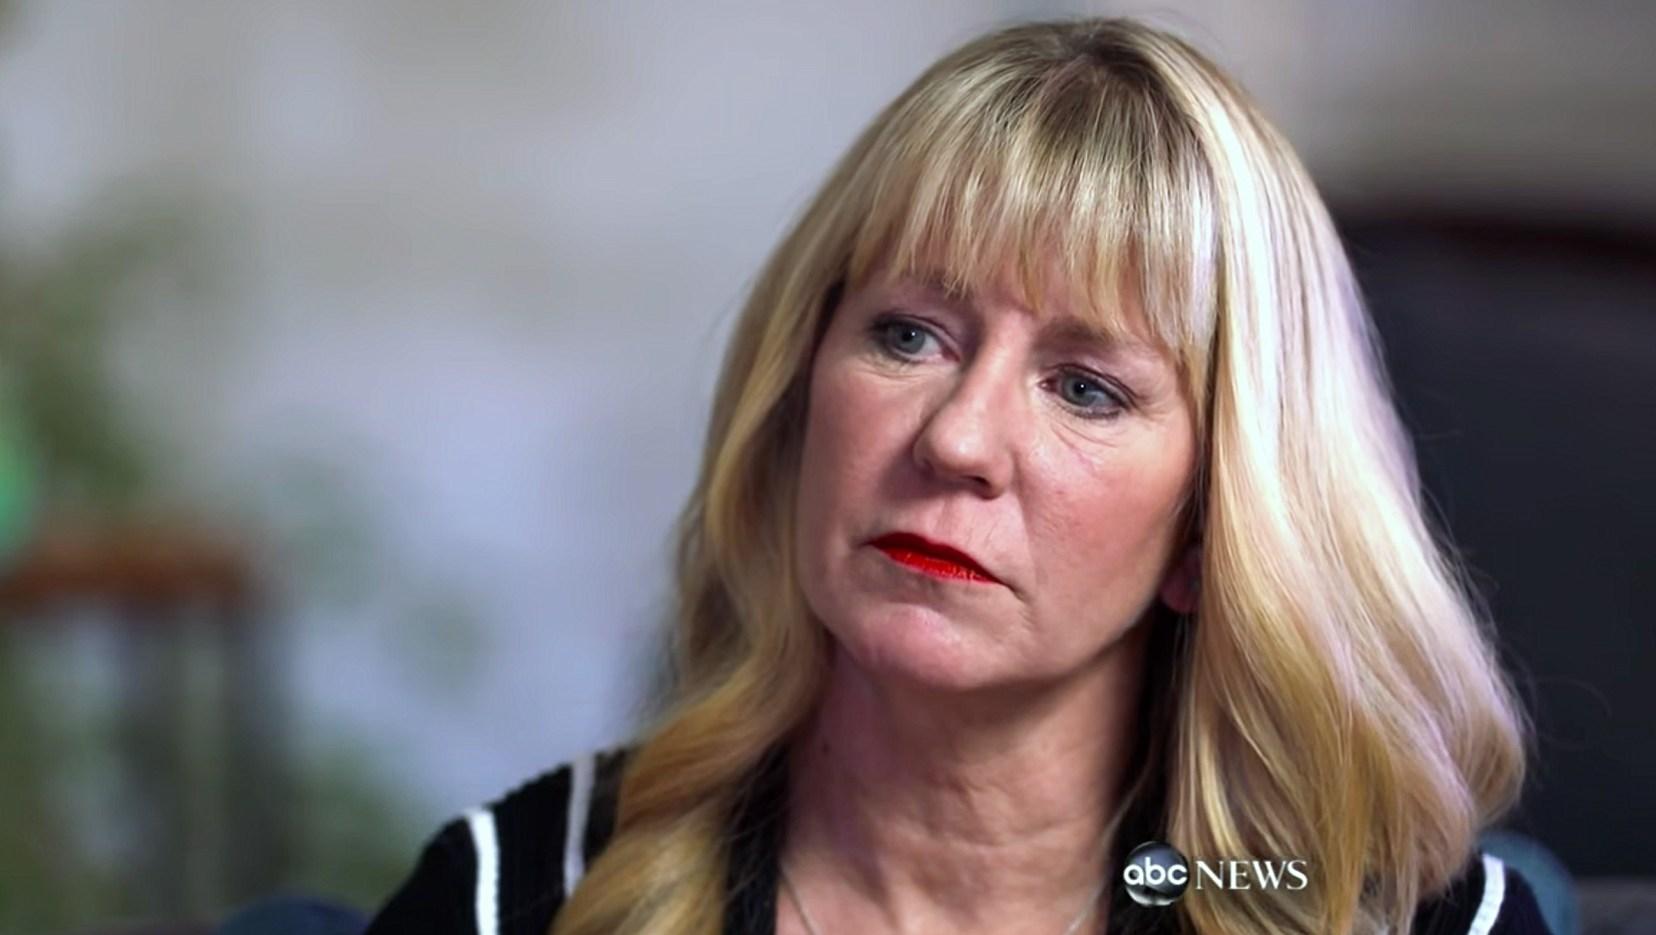 Tonya Harding reflects on her feud with Nancy Kerrigan on ABC News